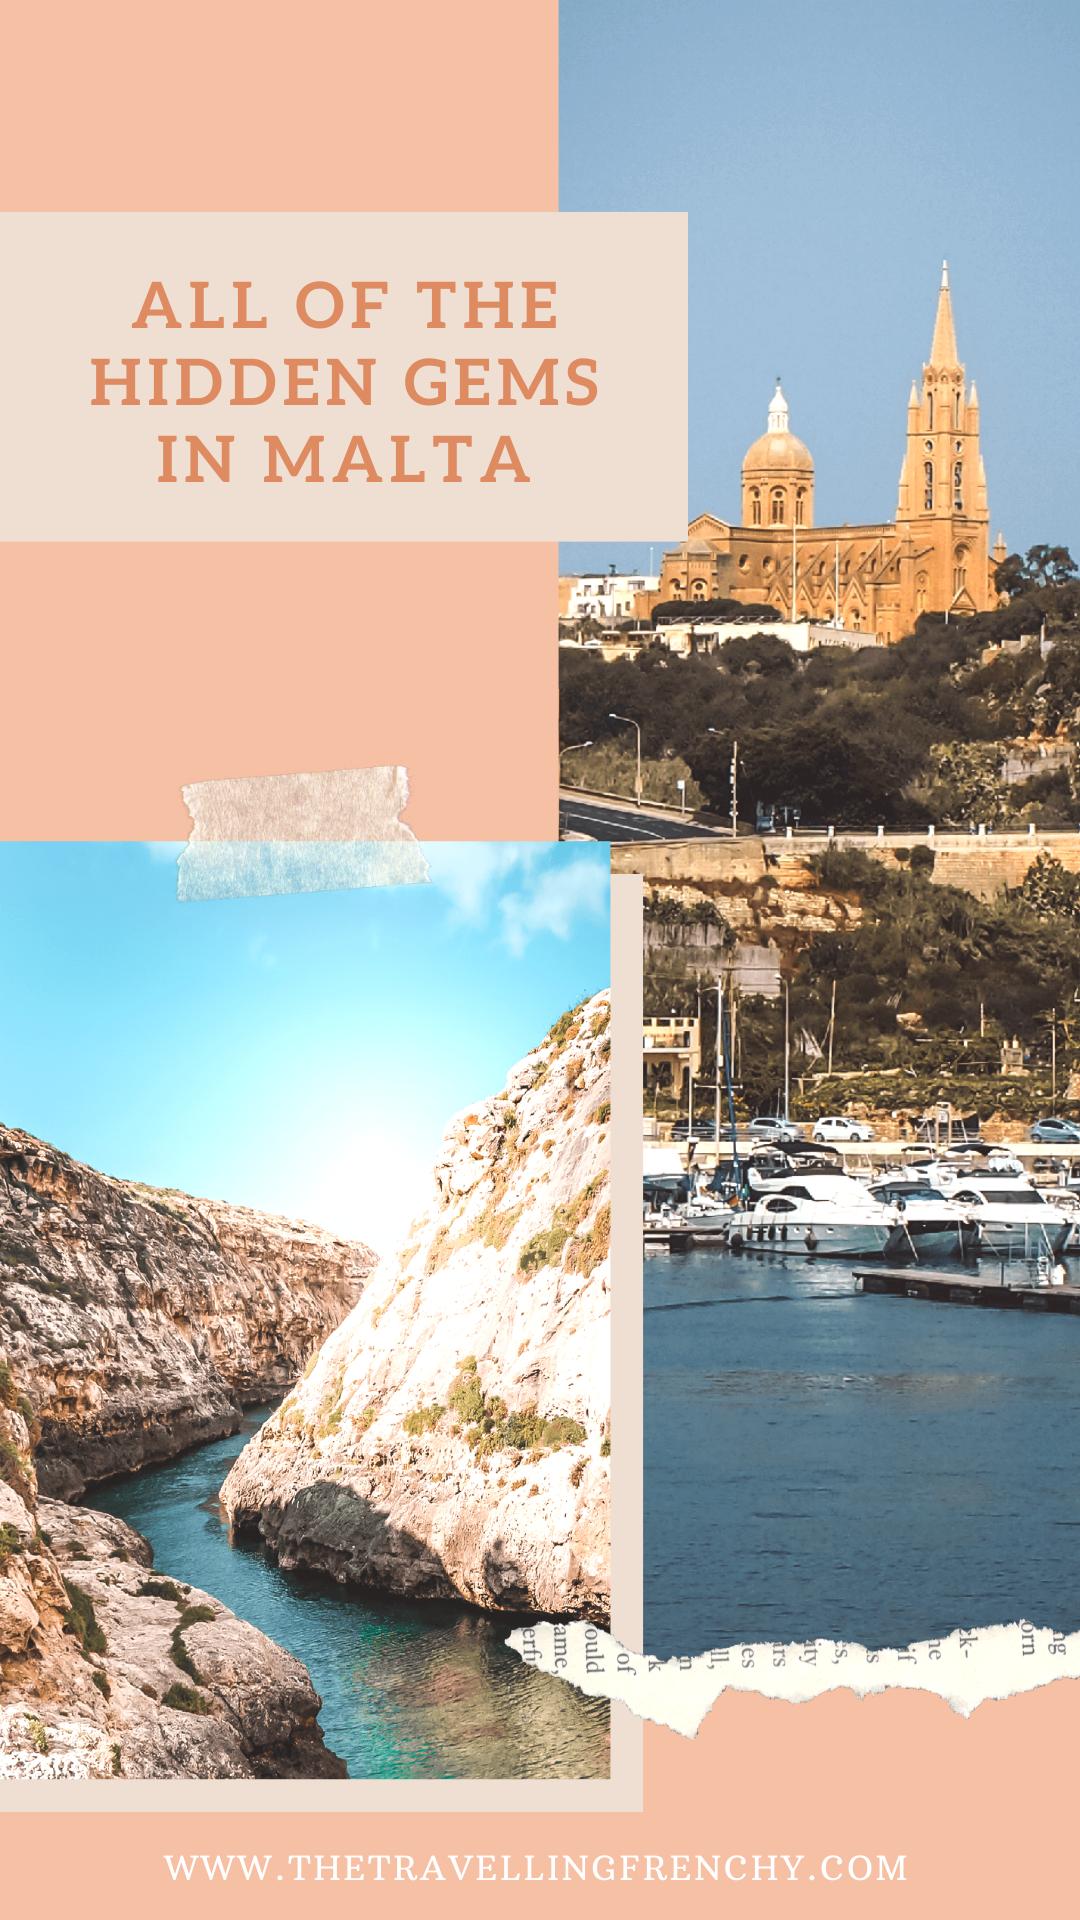 All of the hidden gems in Malta, best photo stops and secrets about Malta #Malta #Gozo #Travel #Travelblogger #Instagram #PhotoSpots